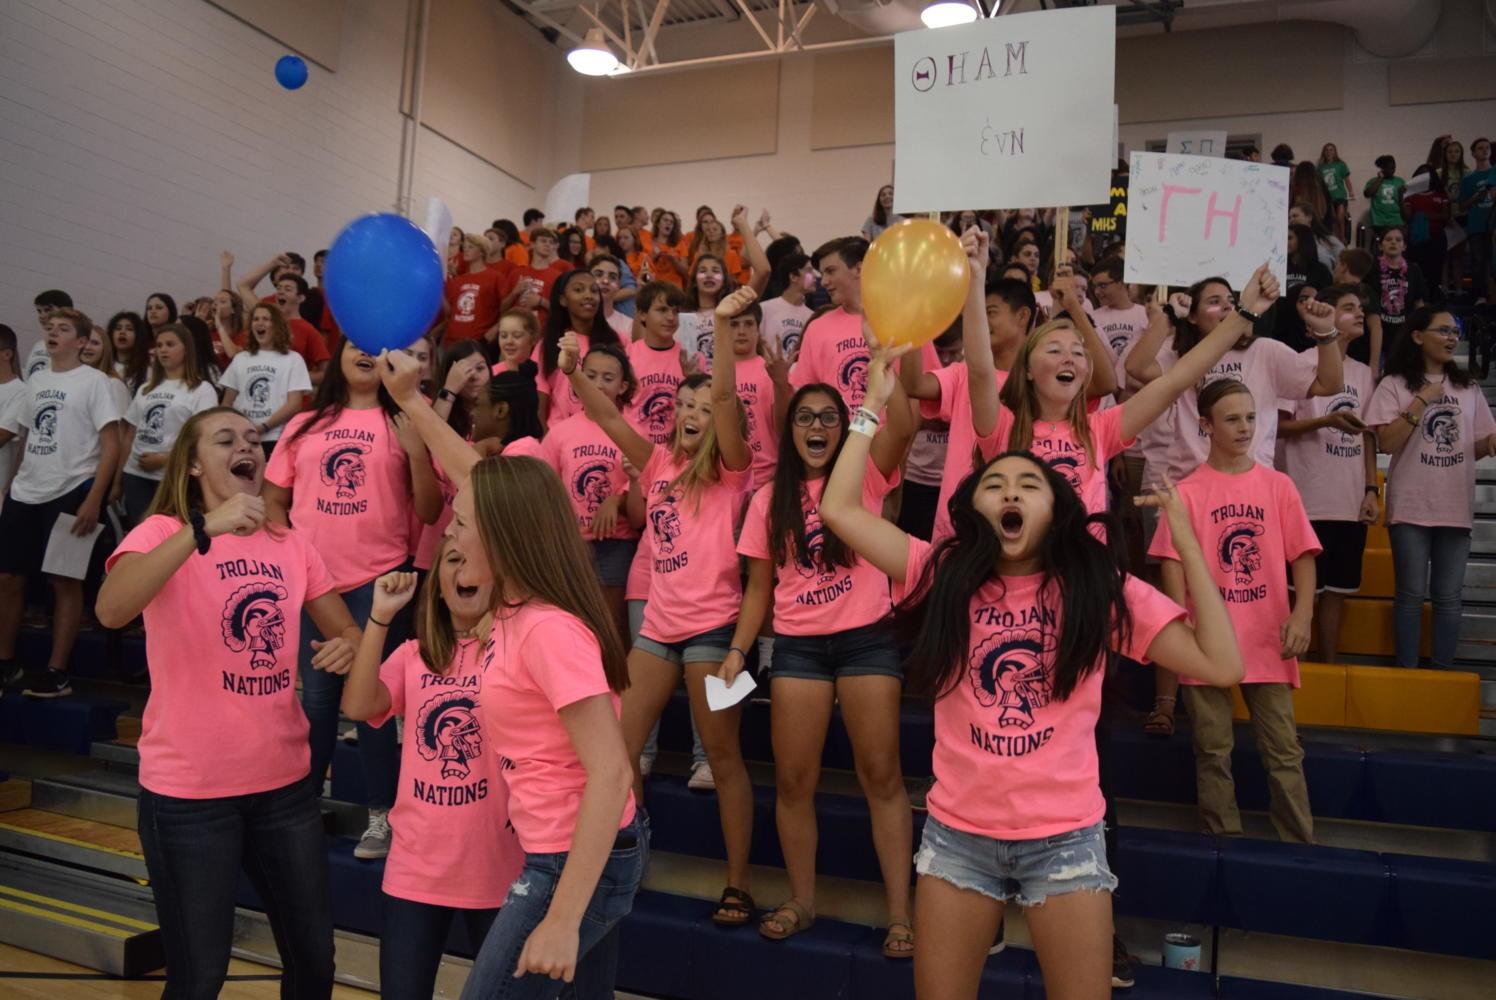 The pink Trojan Nation team shows their spirit.